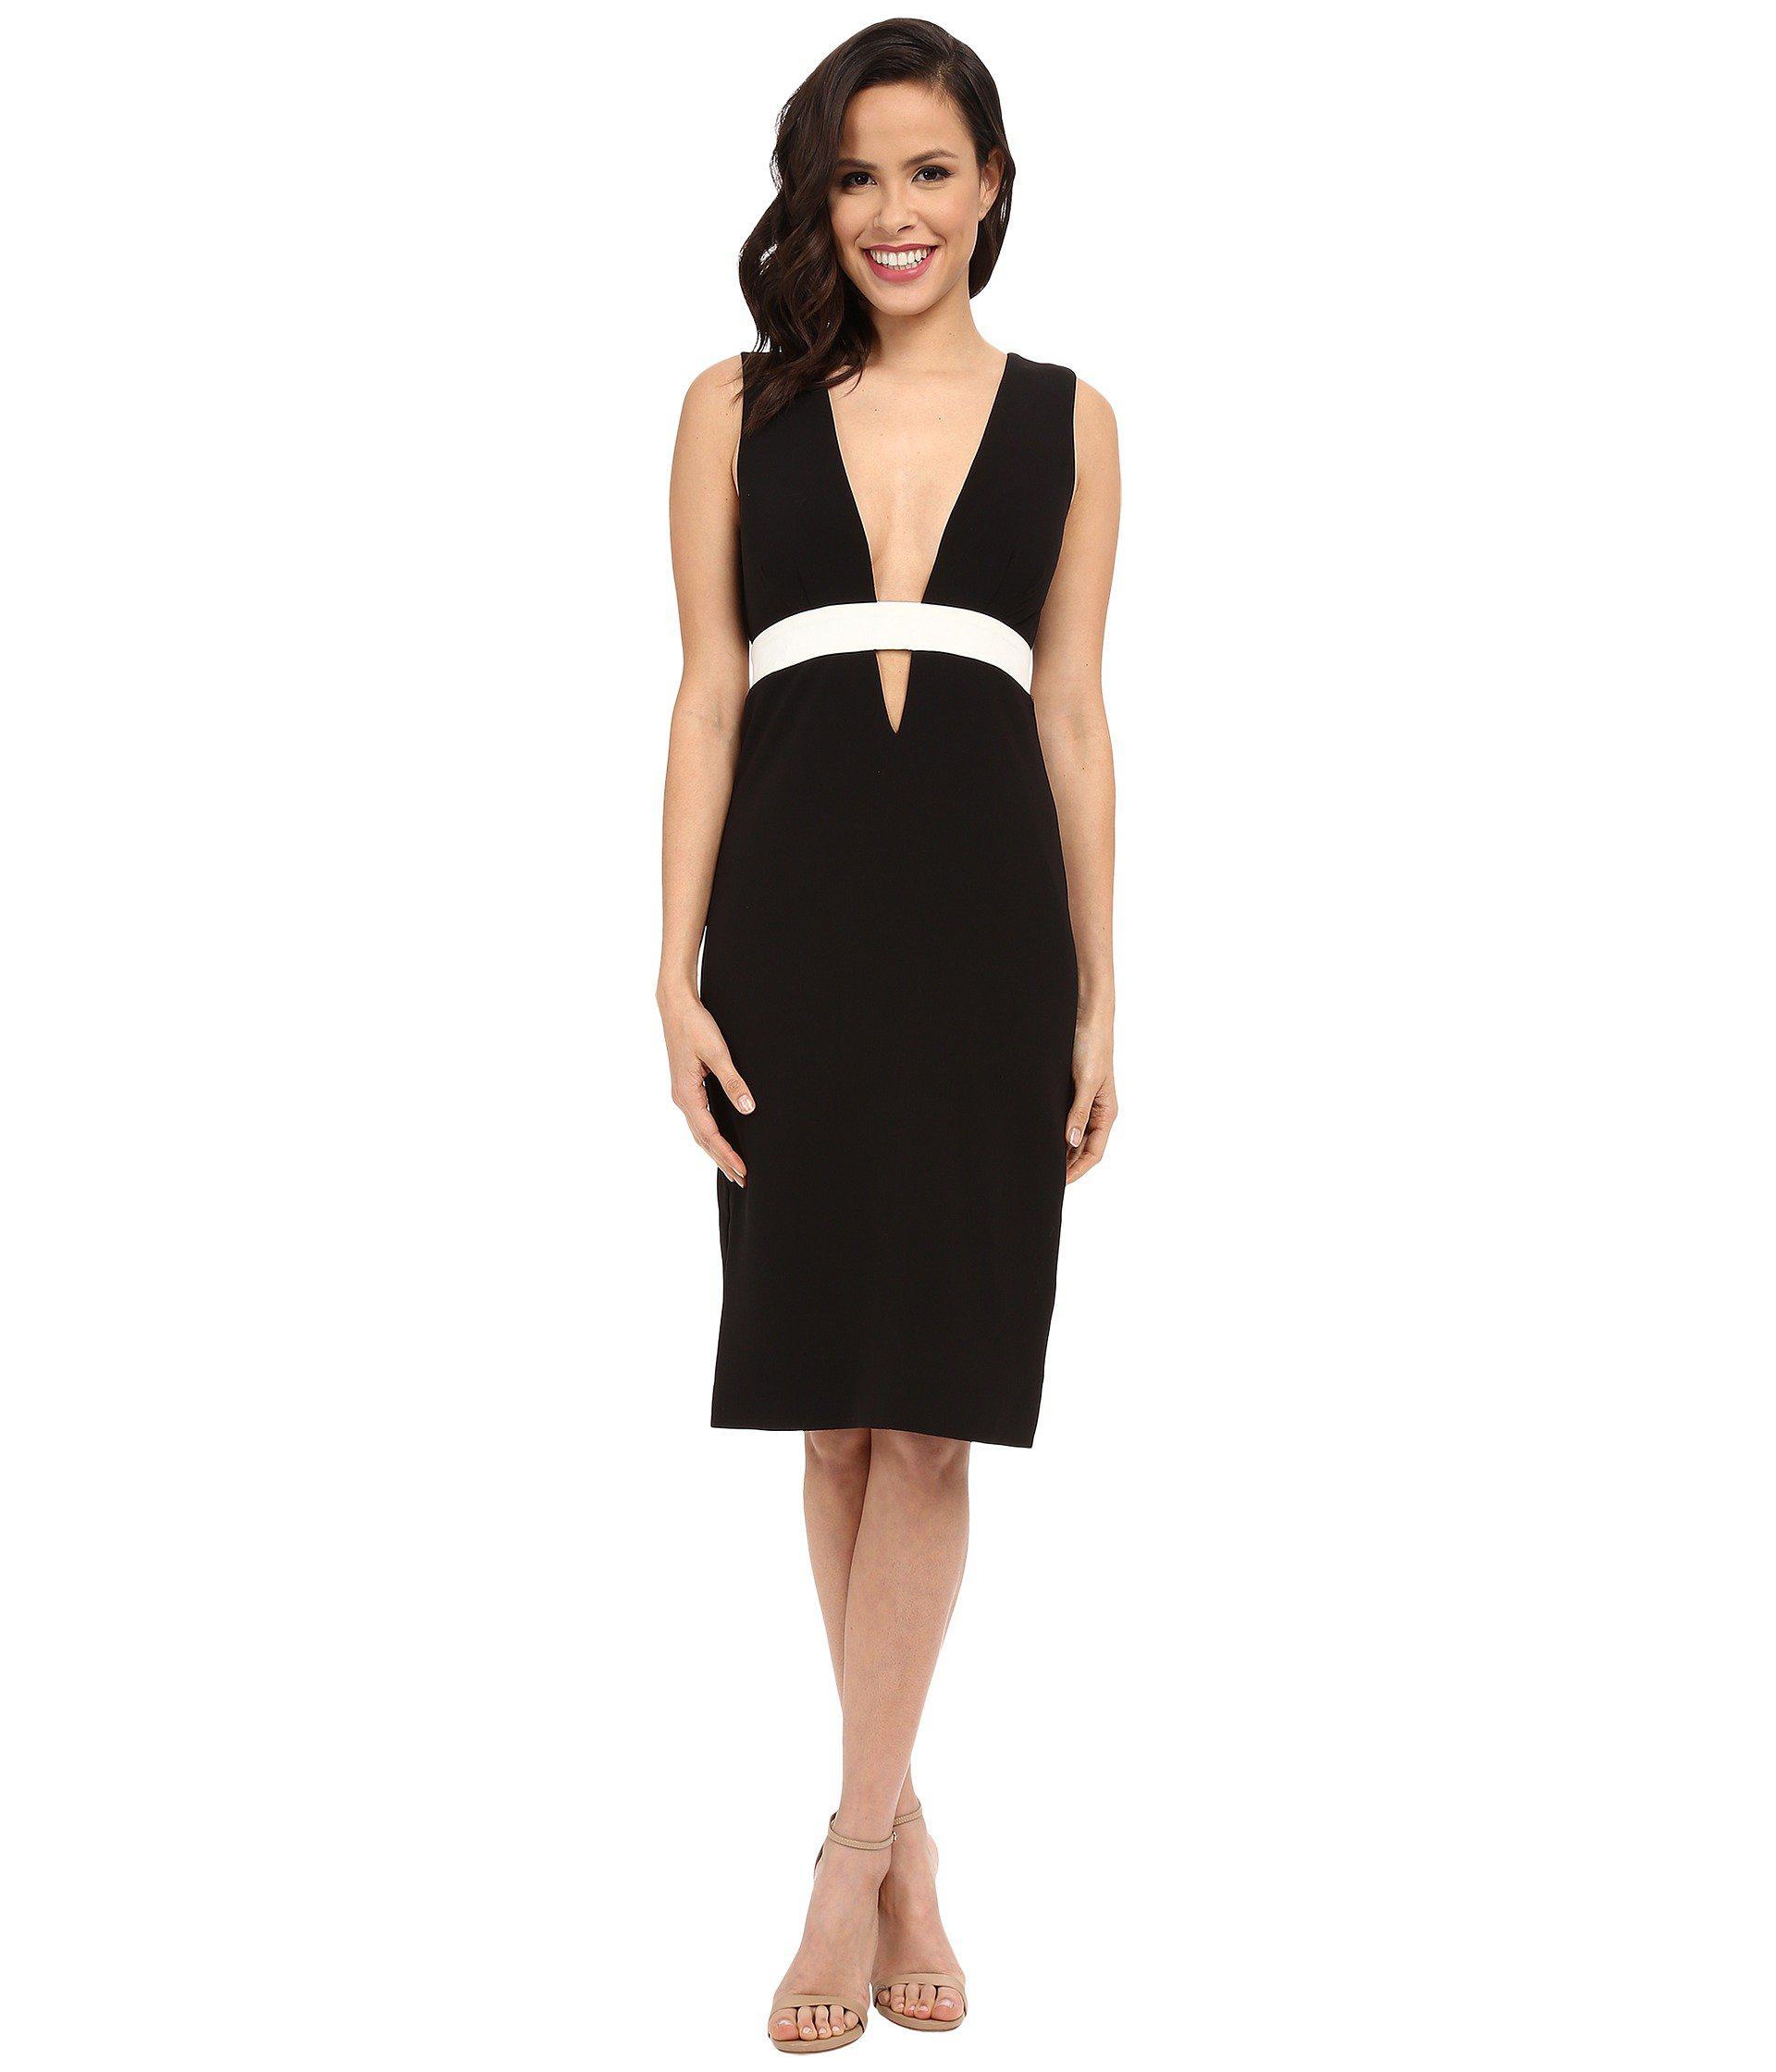 1b3d1c1fcc2 Lyst - Nicole Miller Viola Color Black Cocktail Dress in Black ...